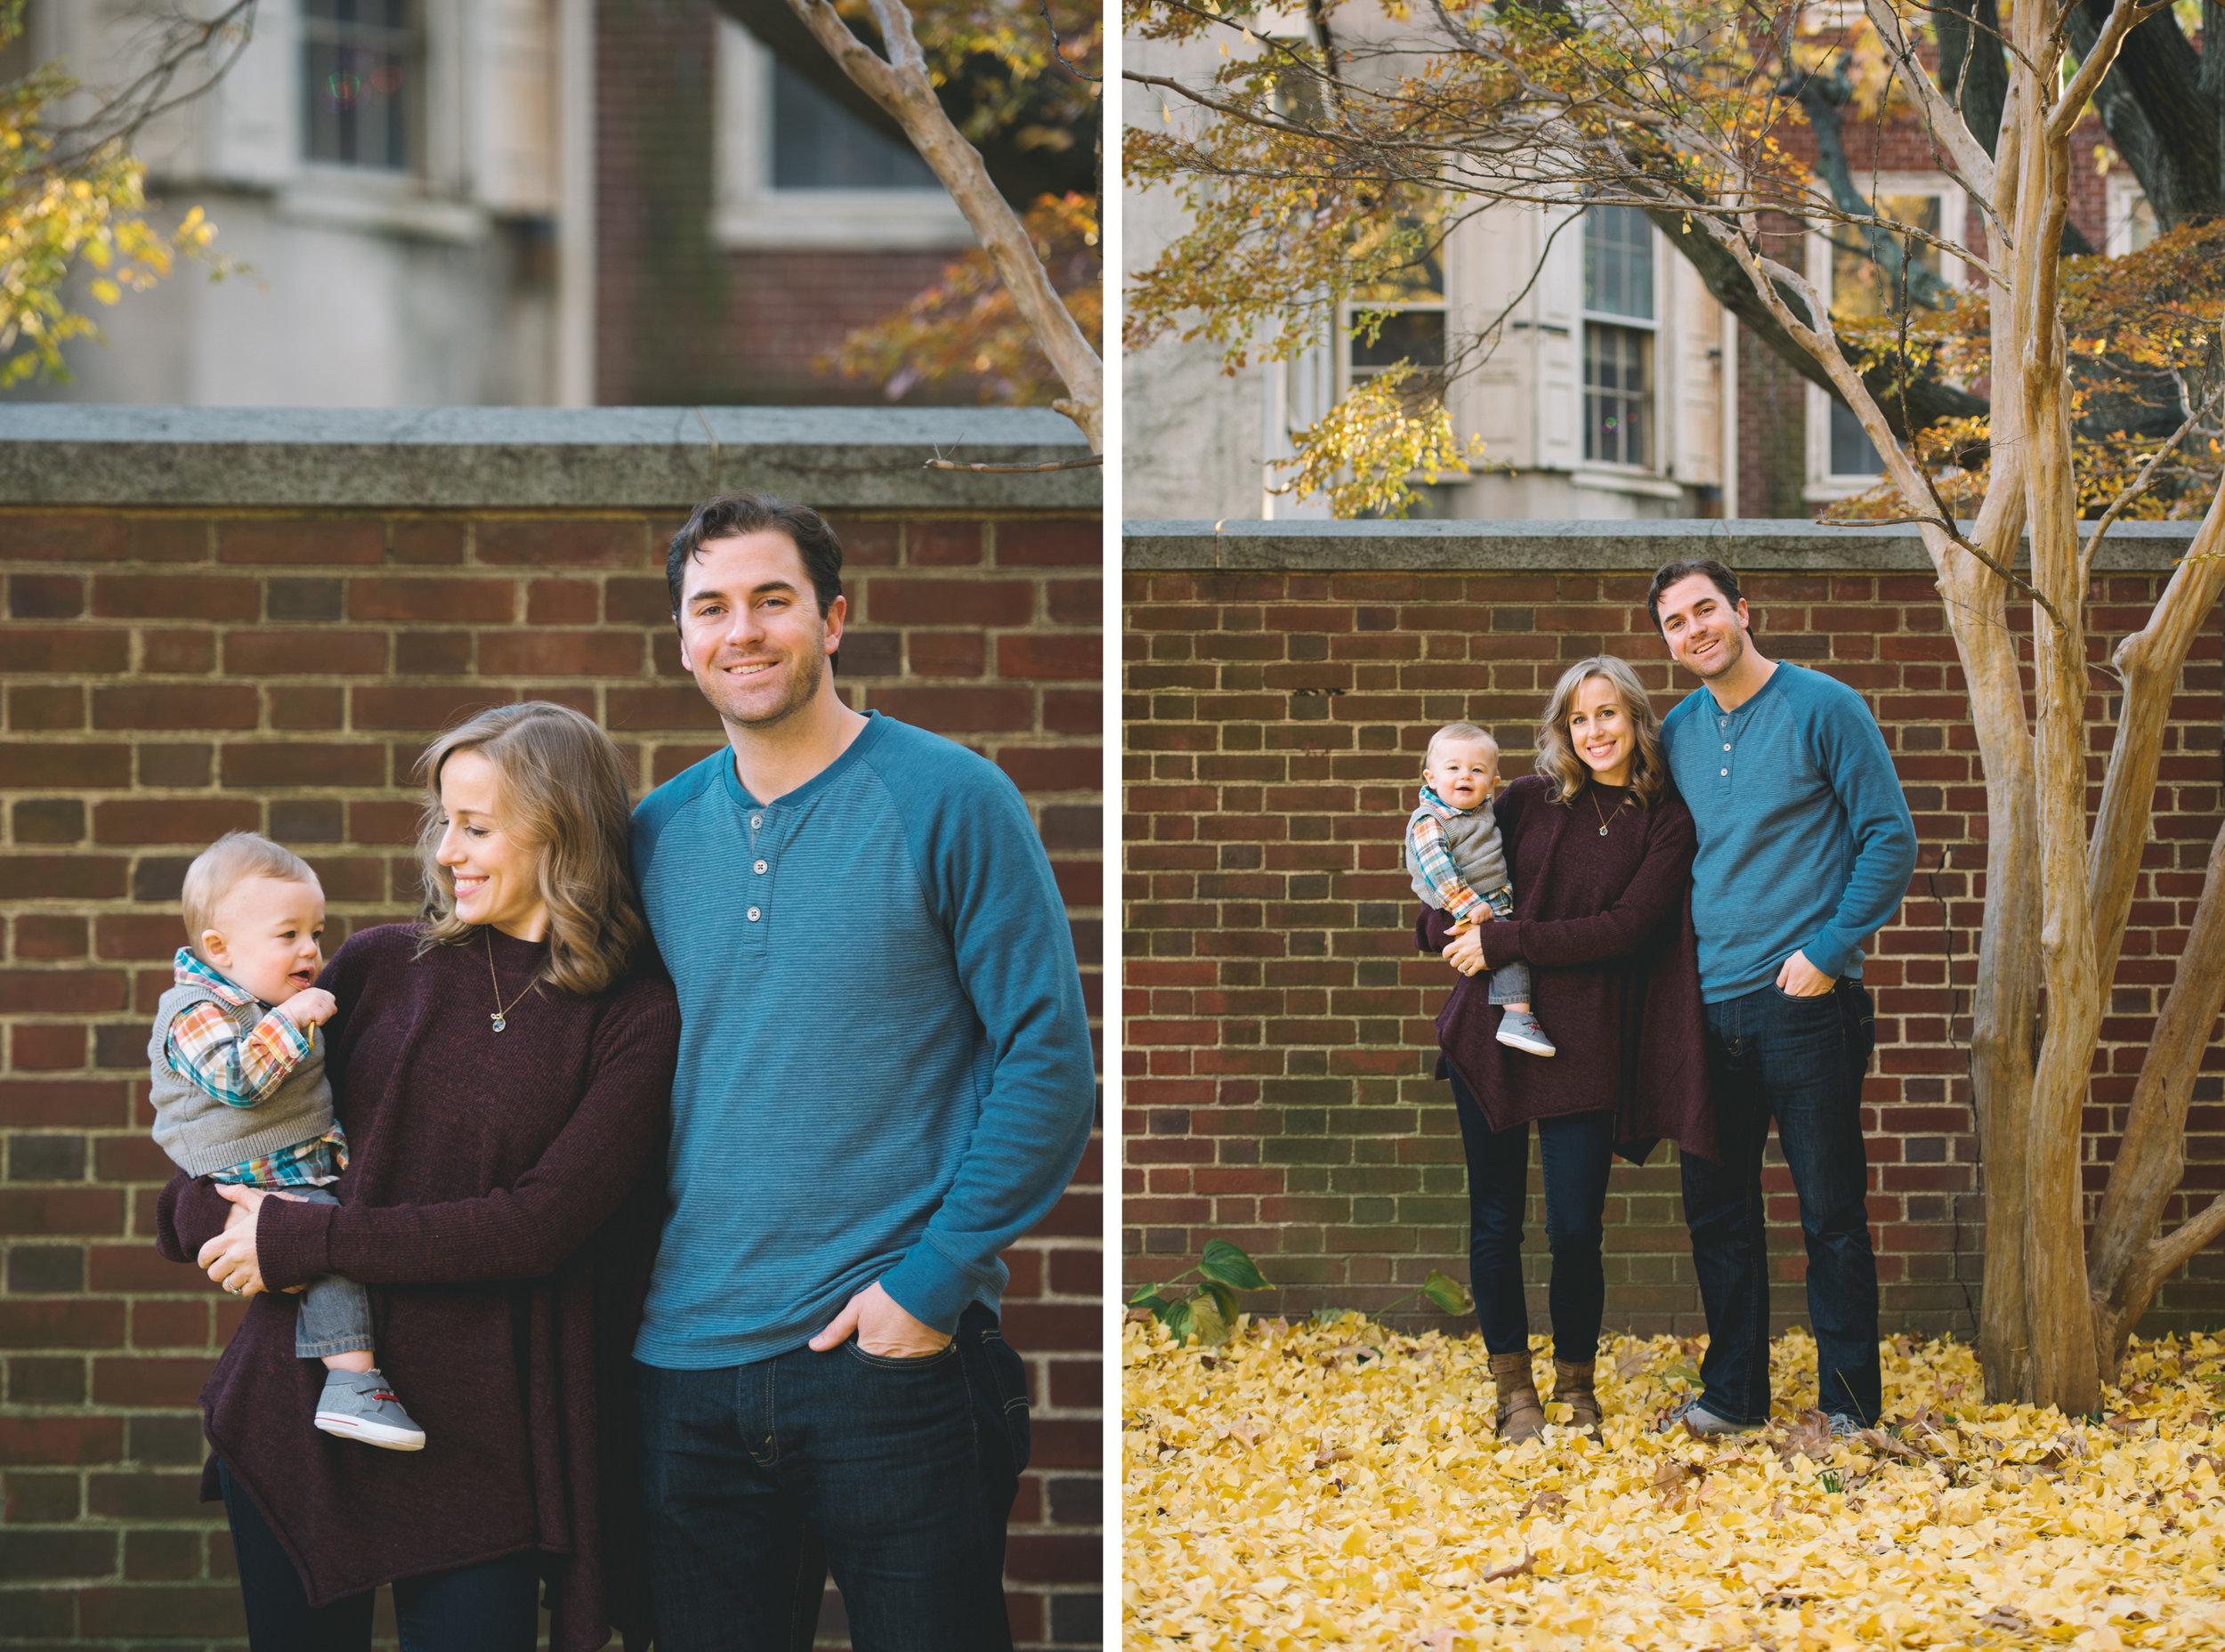 Peaberry-Photography-Philadlphia-Family-Portraits-006.jpg